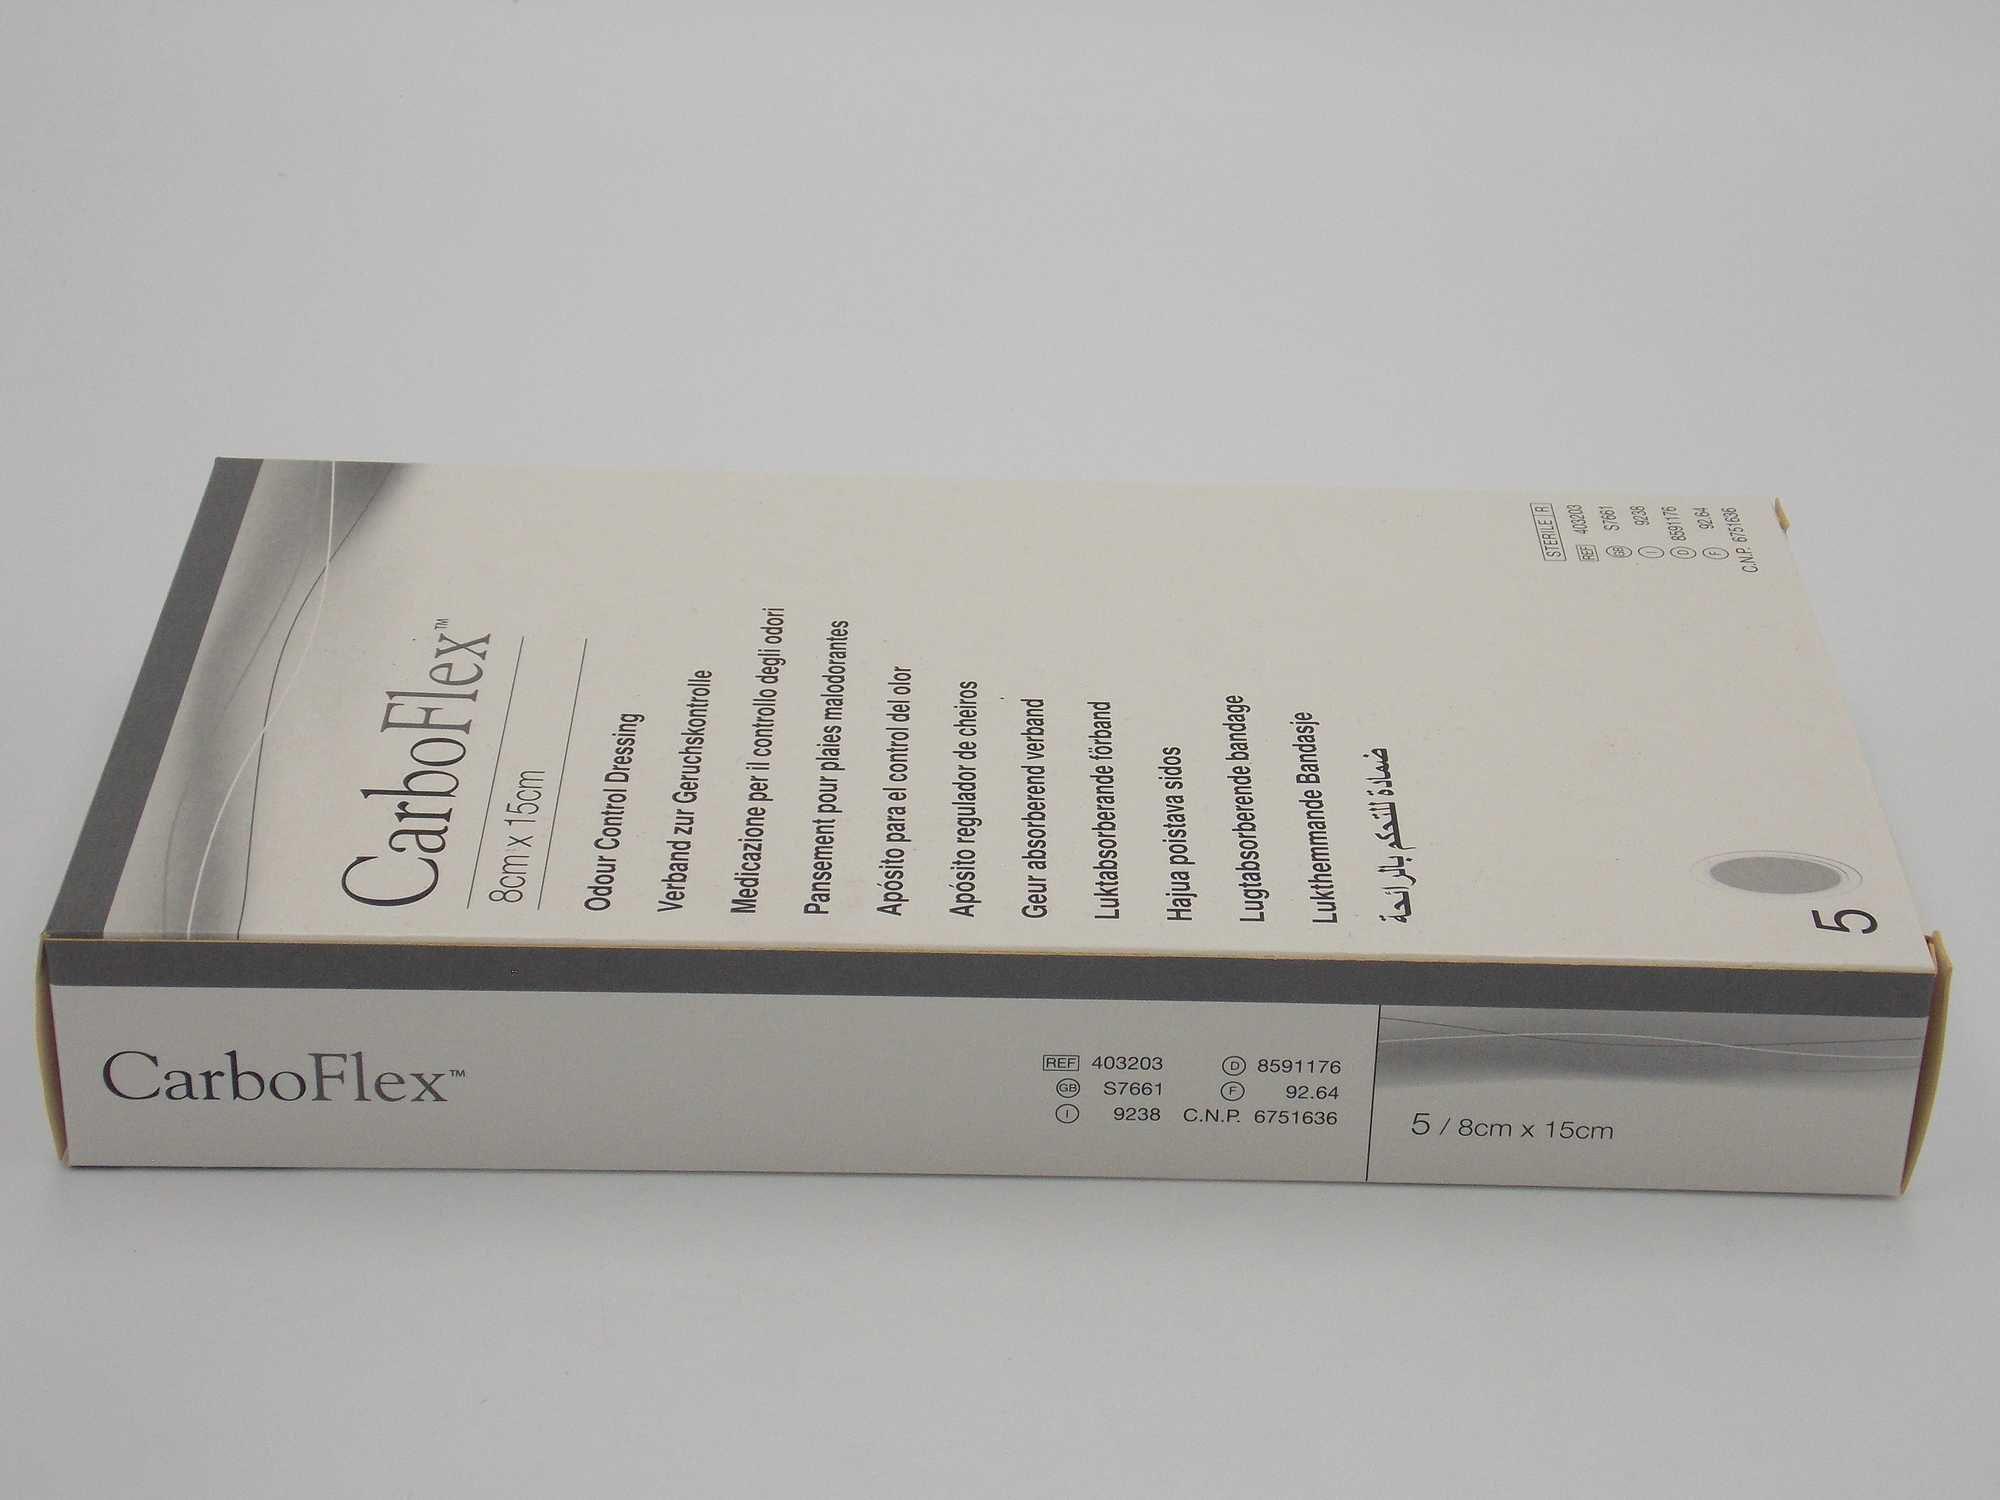 CURATIVO CARBOFLEX  8CM X 15CM OVAL UND. 403203 - CONVATEC